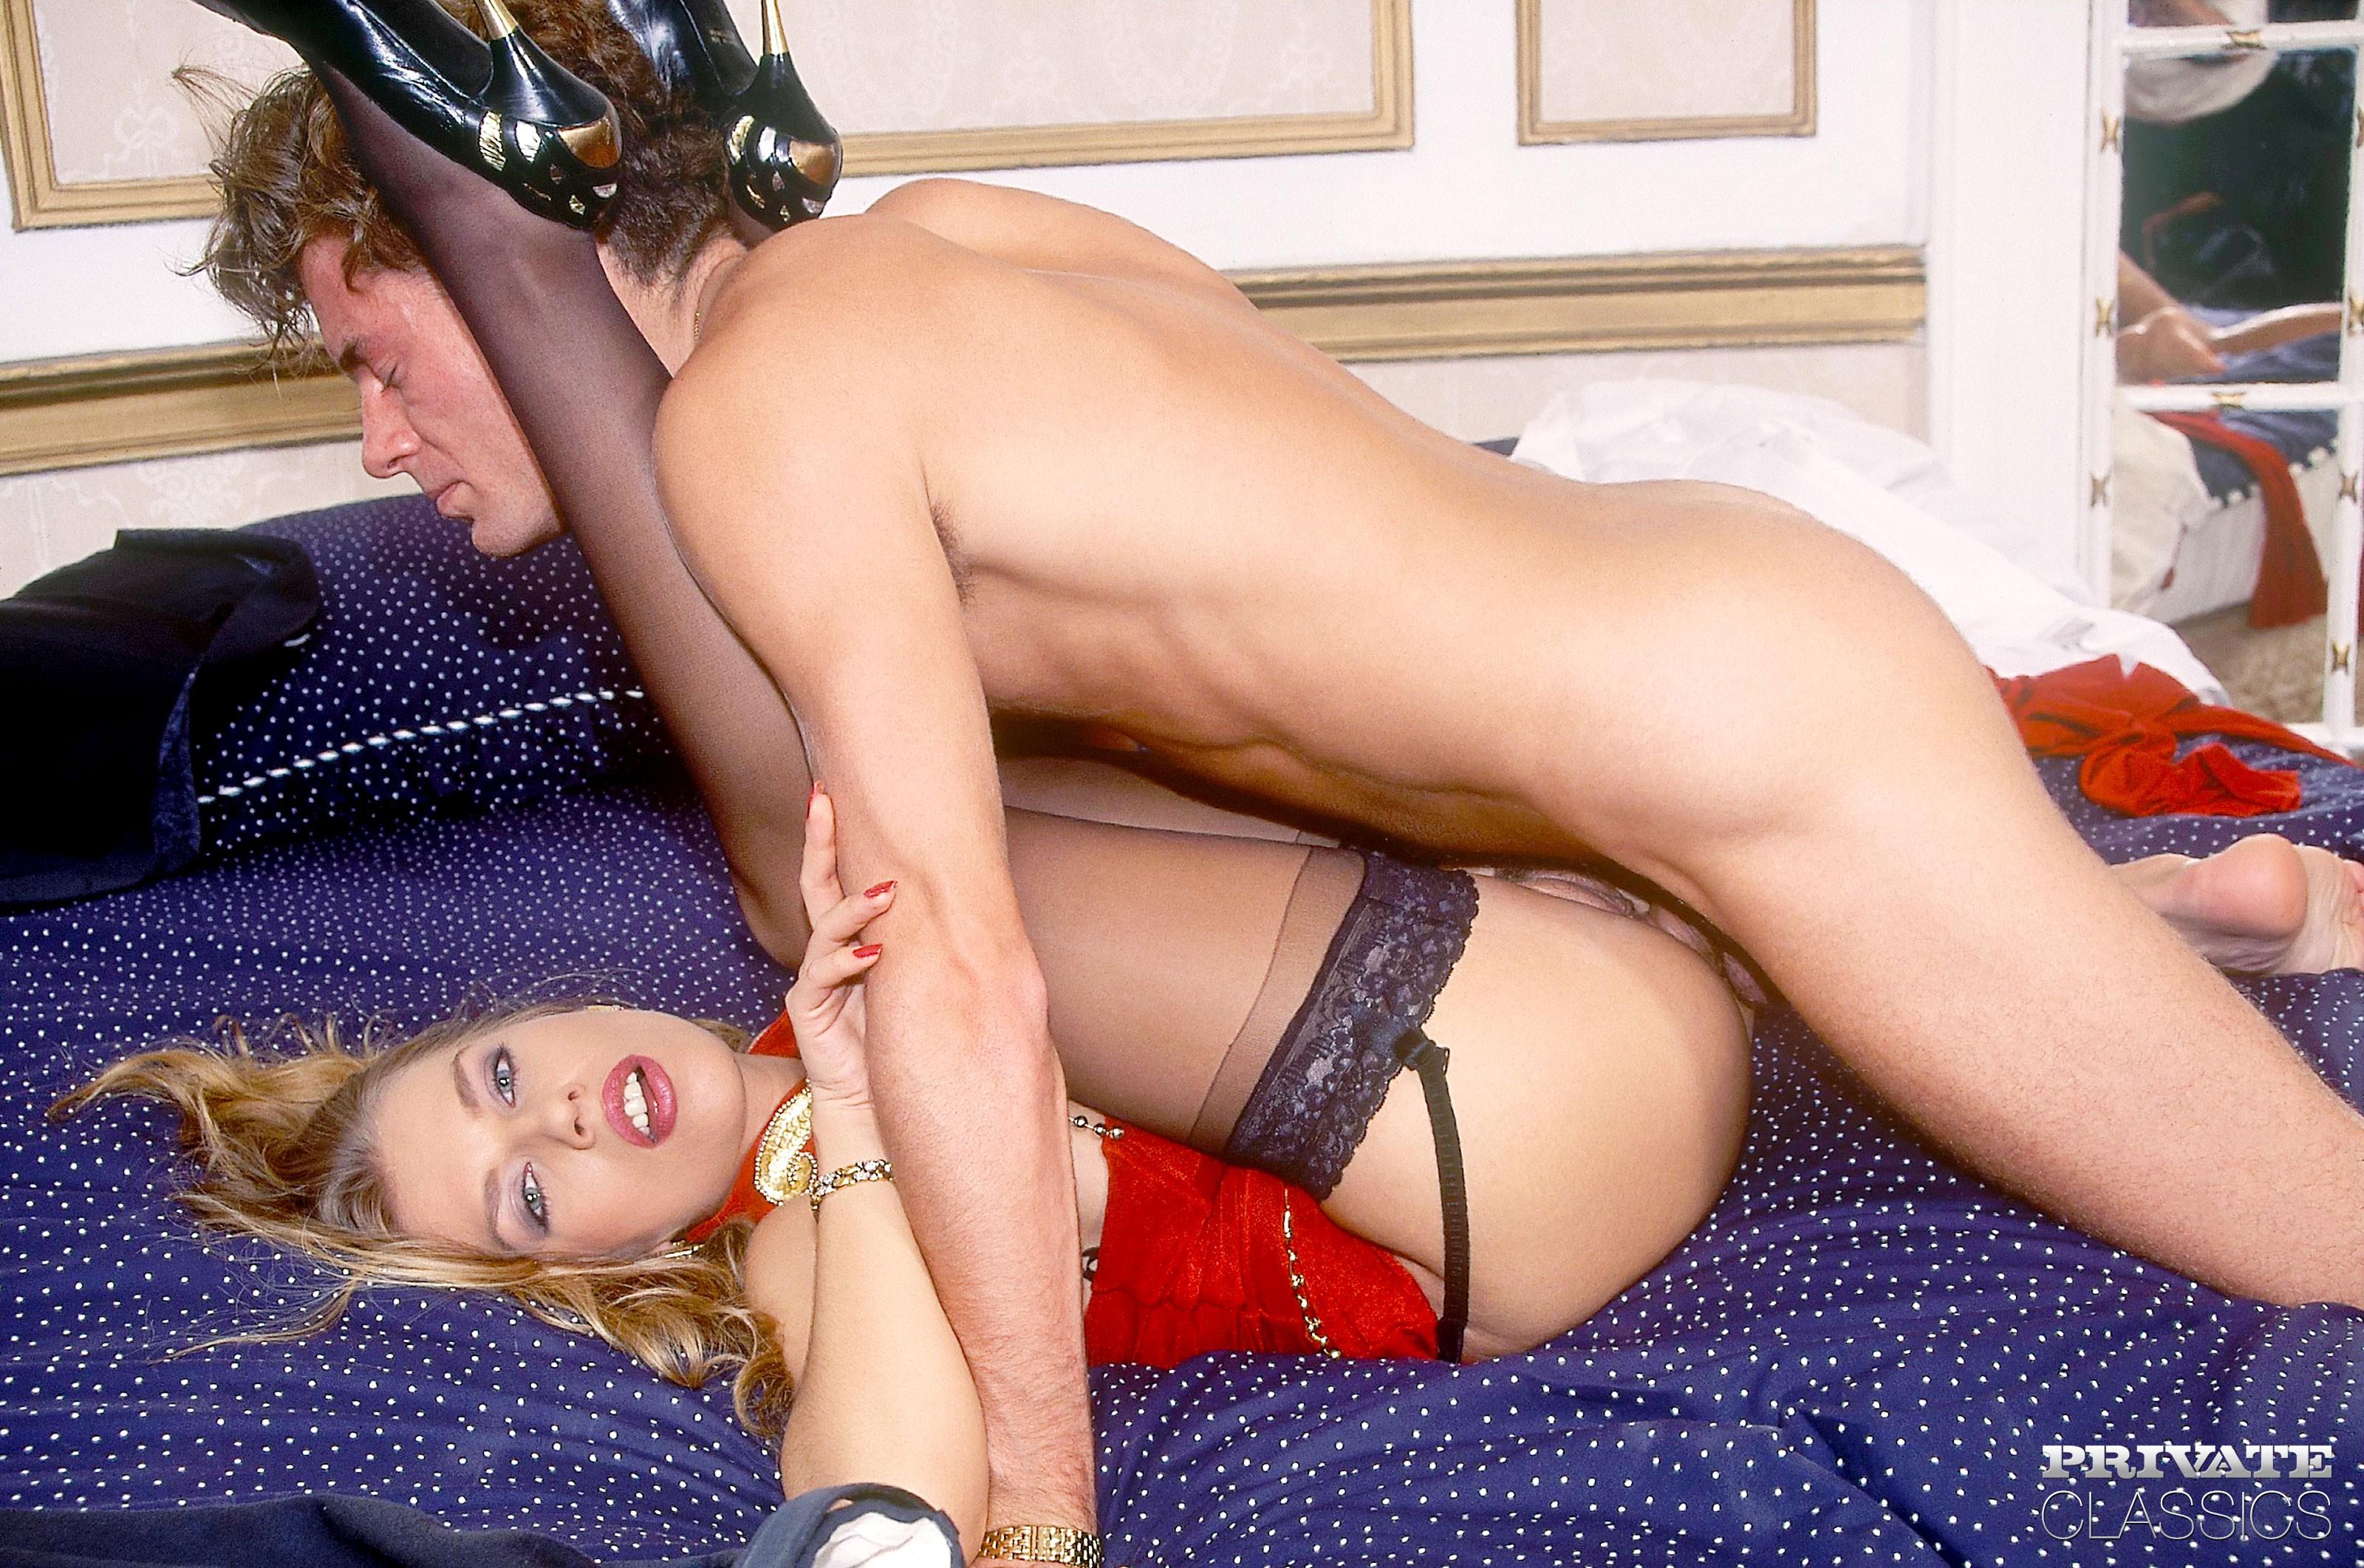 Pornstar legs erotic tgp valuable phrase